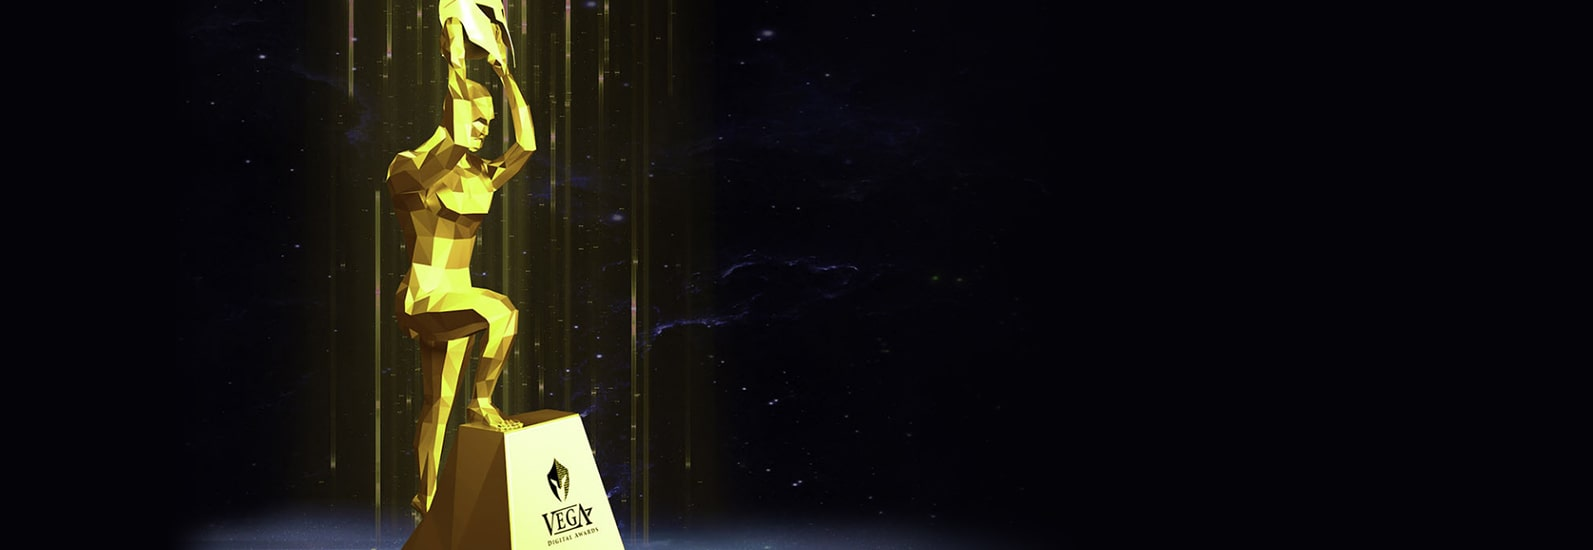 vega web design awards